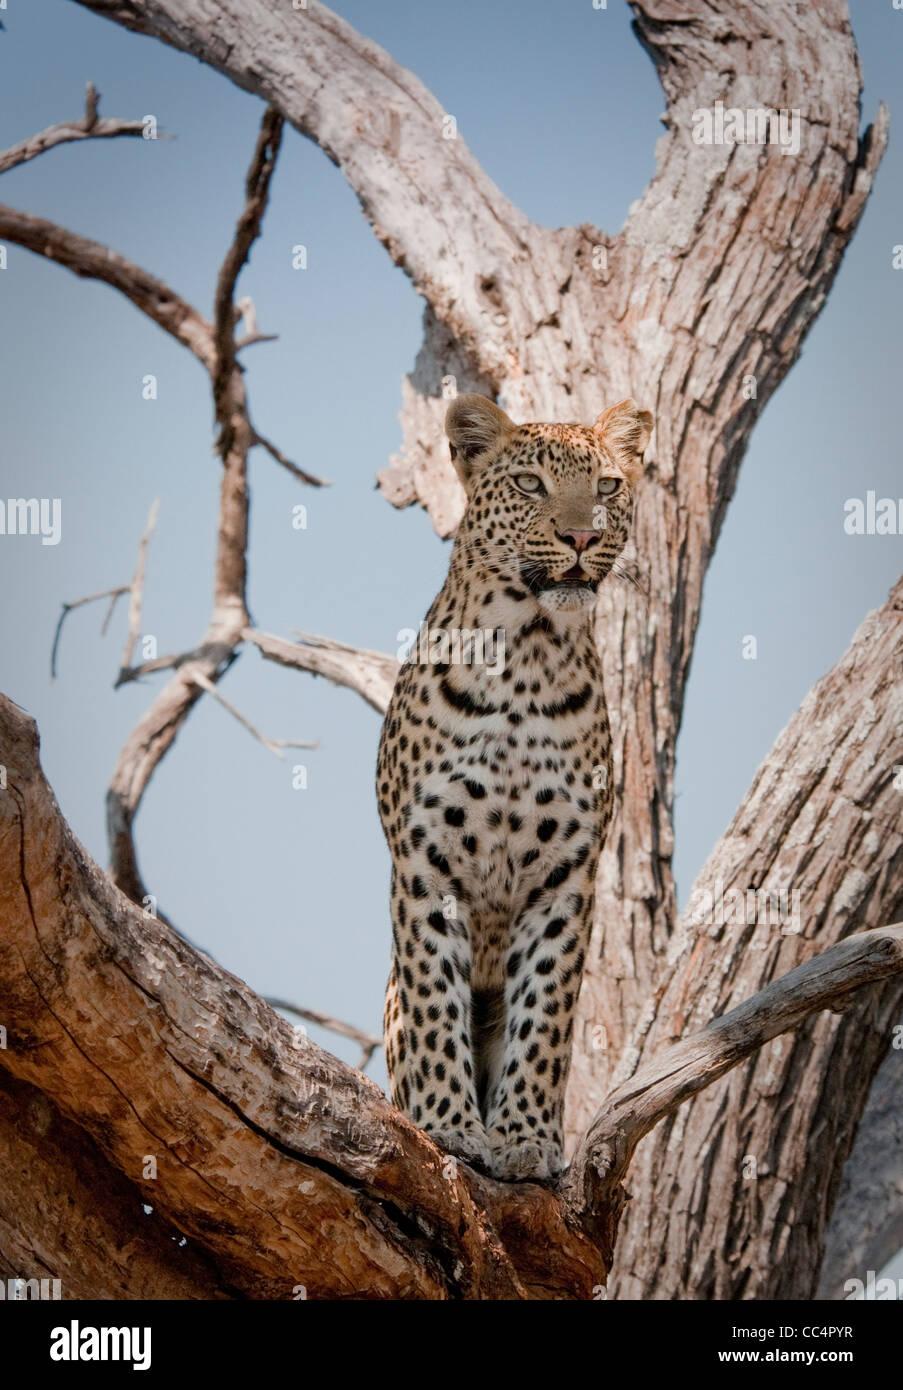 Africa Botswana Tuba Tree-Leopard standing in tree ( Panthera pardus) - Stock Image